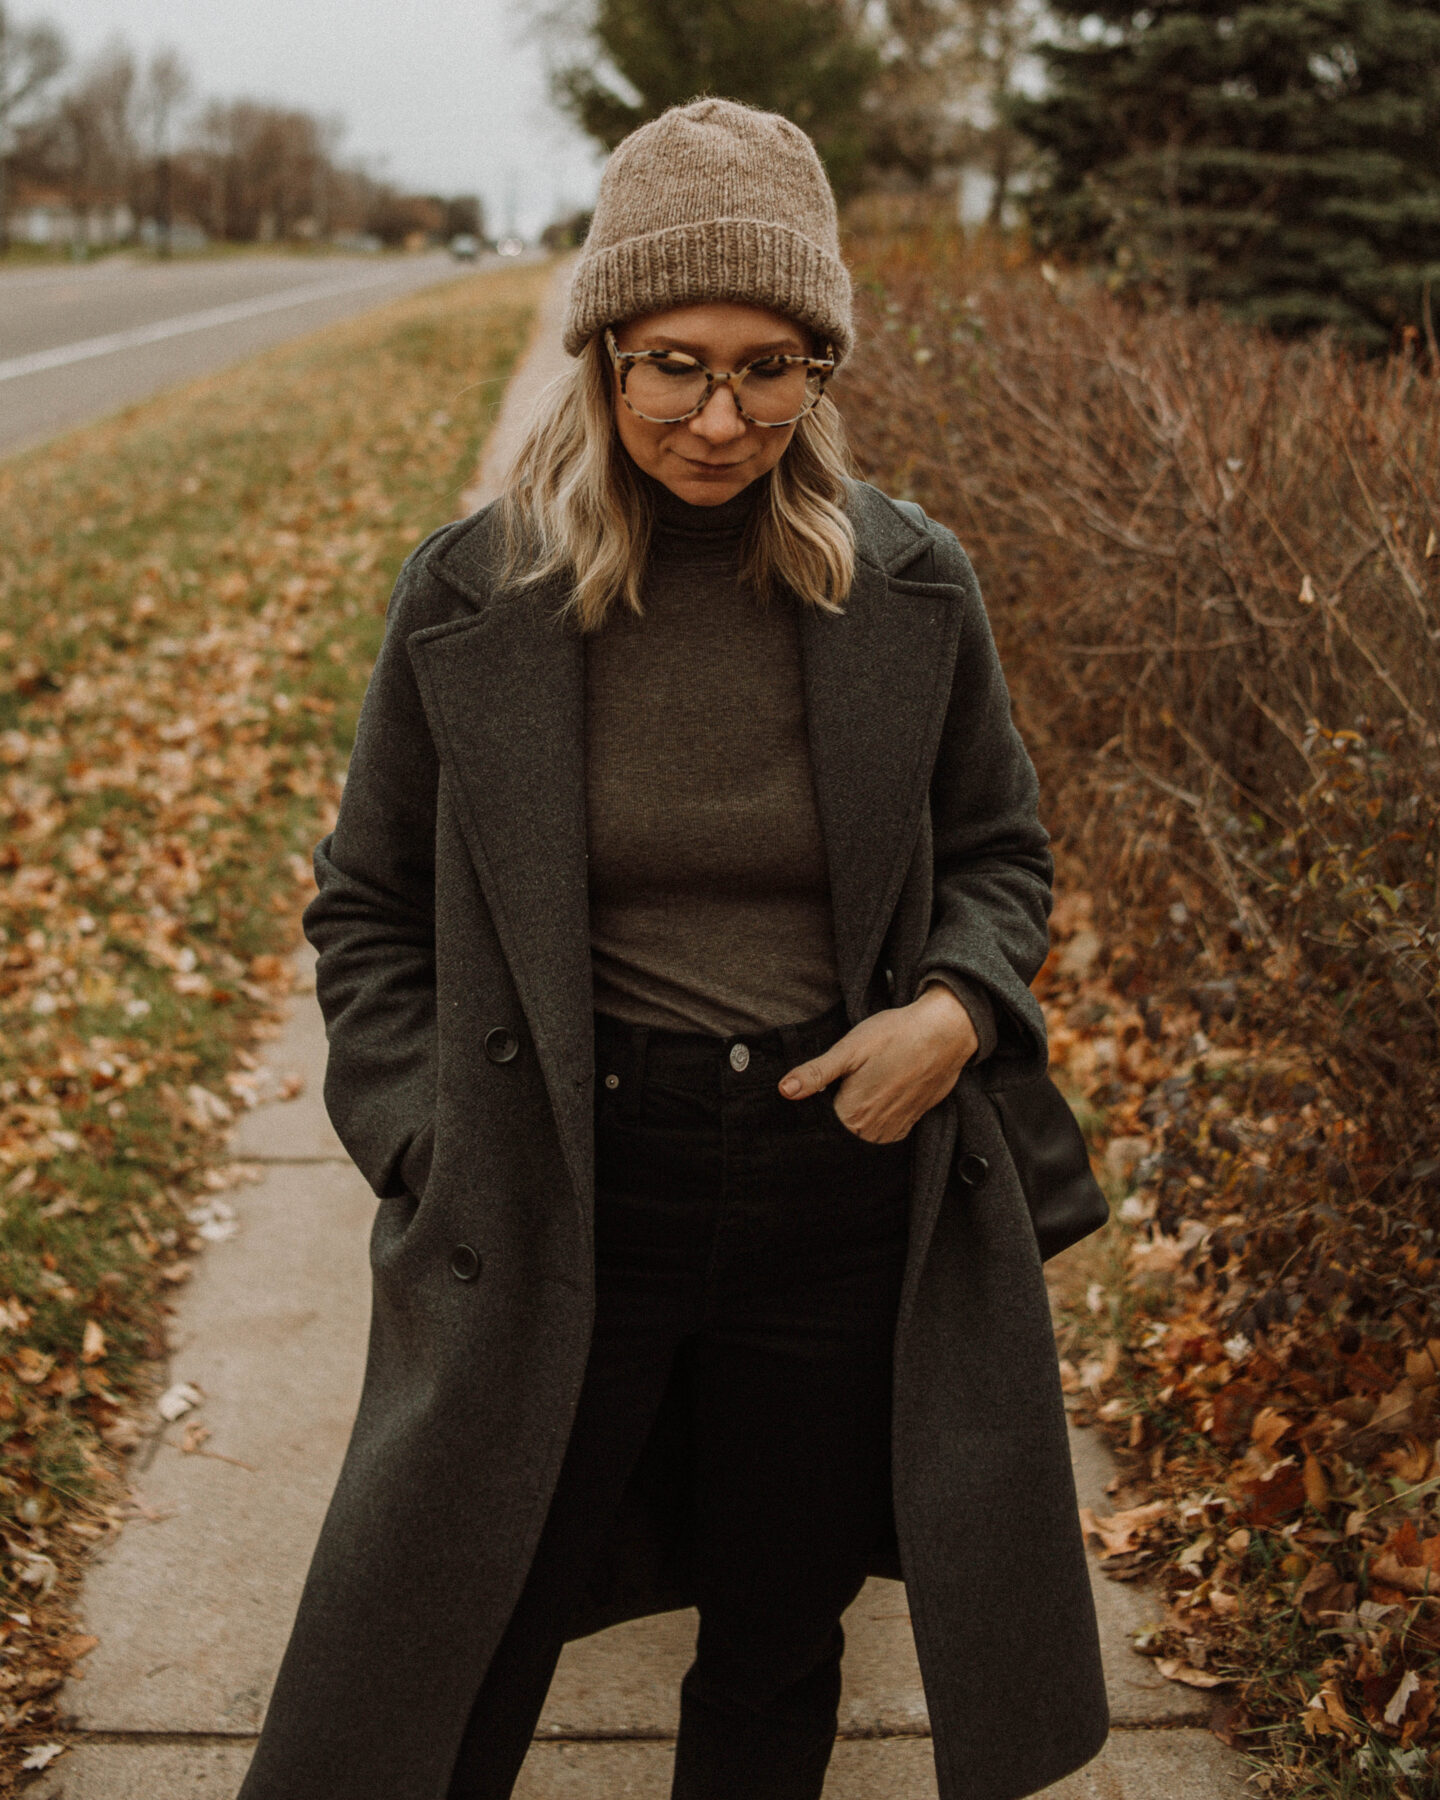 brown and black outfit, everlane pima microrib turtleneck, madewell dad jean, everlane tread sneakers myssifarmi hat